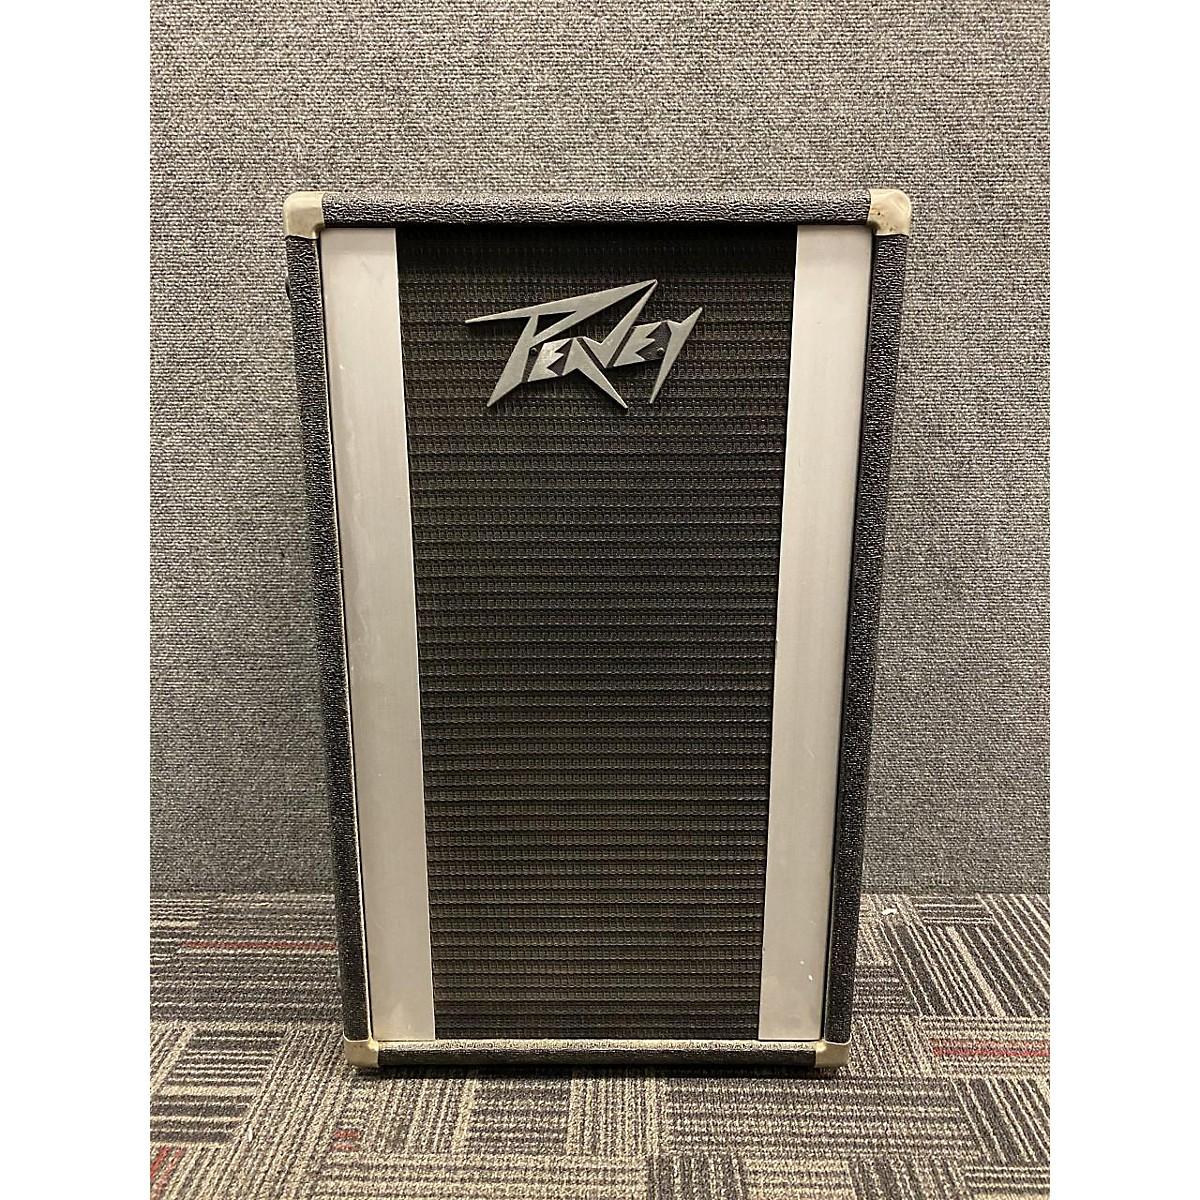 Peavey Enclosure 1x12 Bass Cabinet